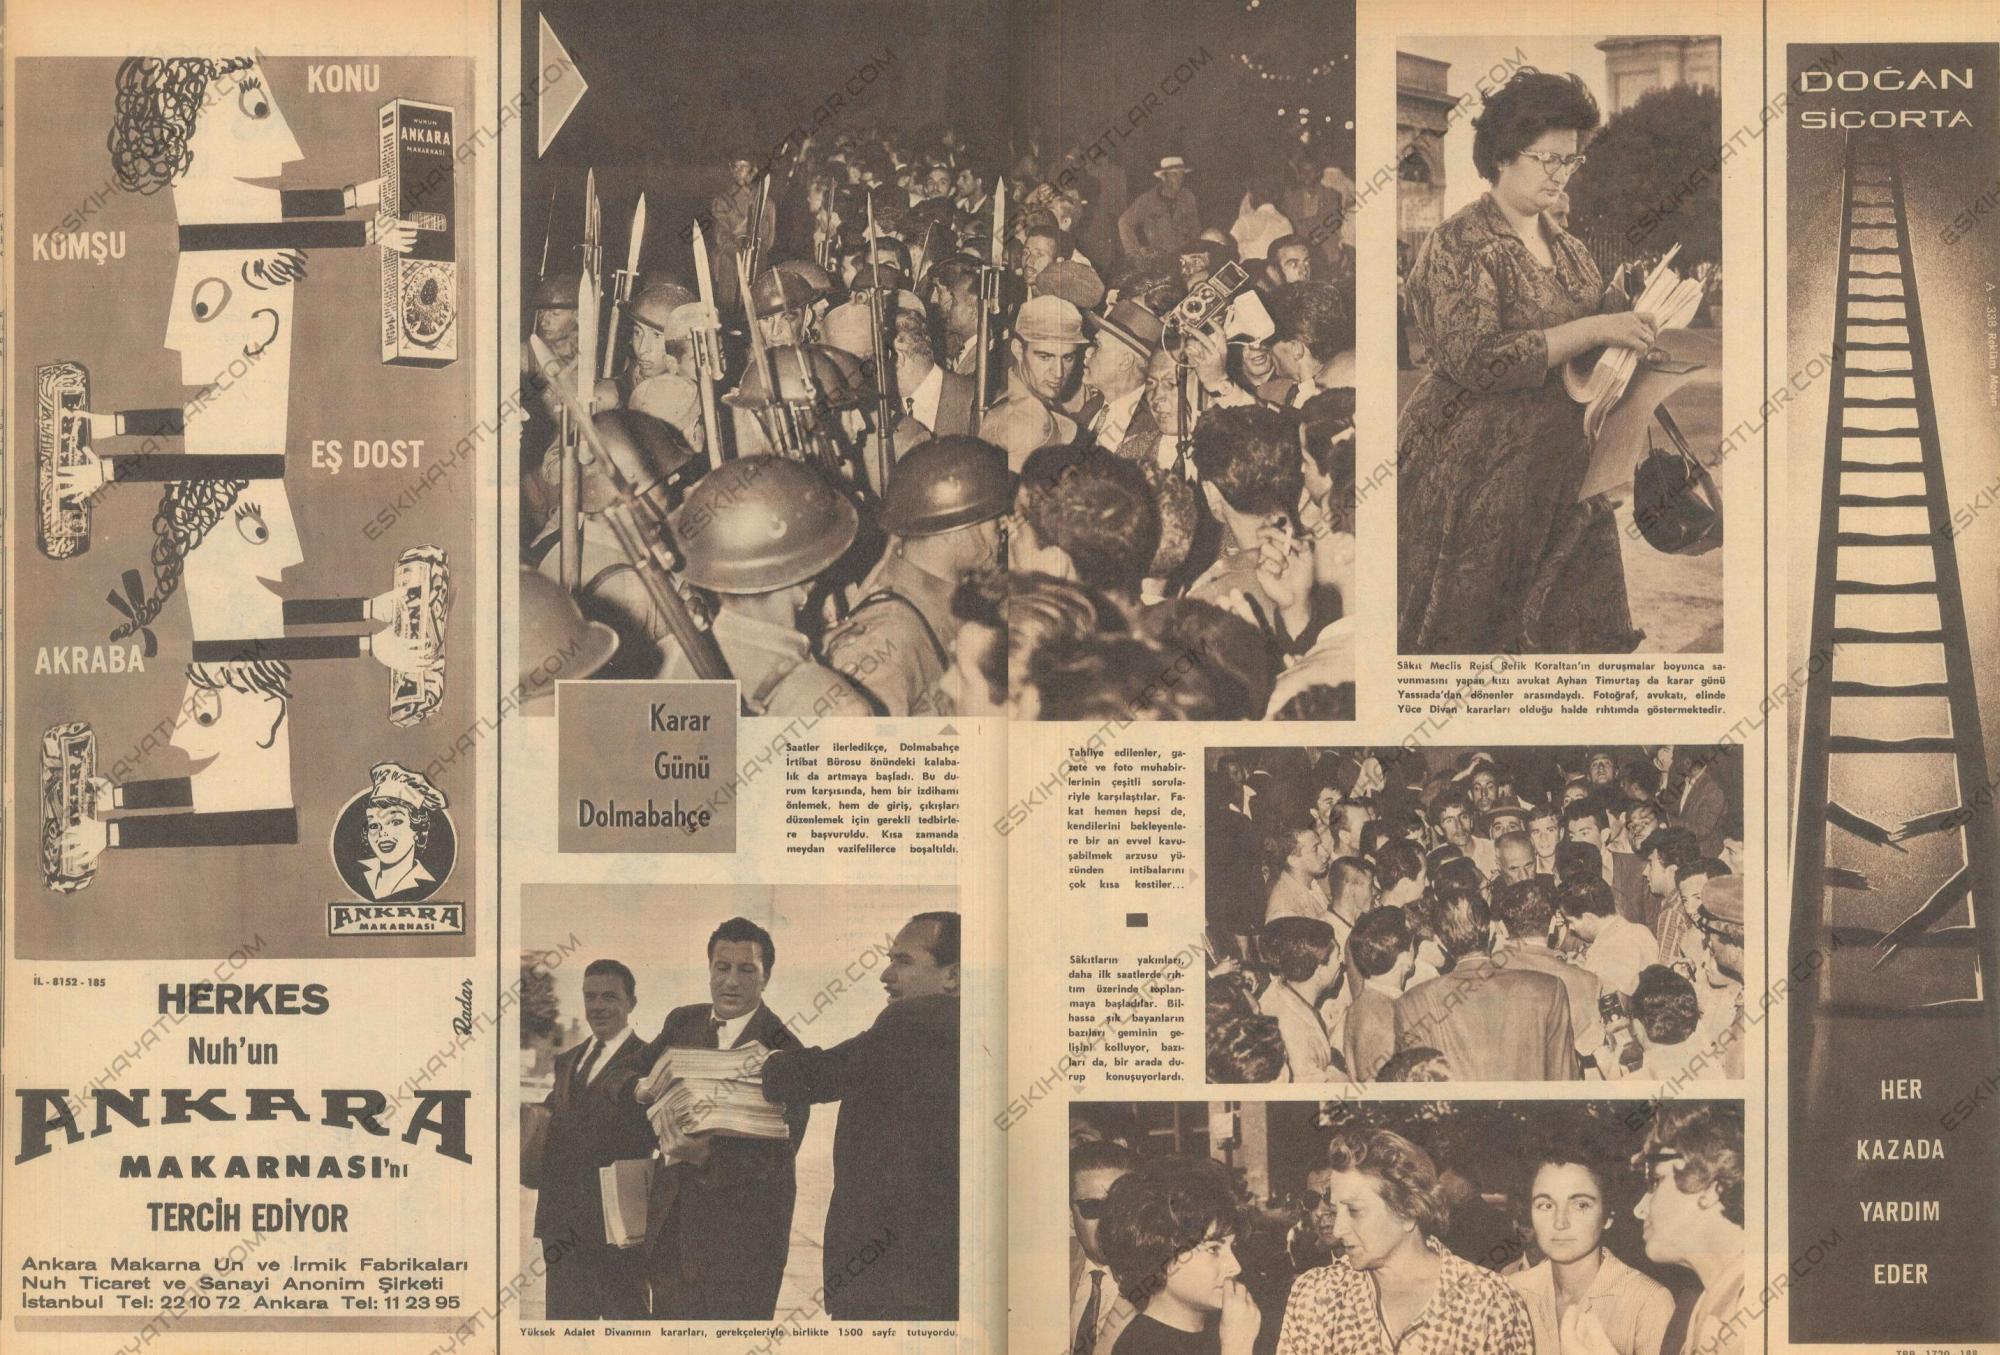 1960-ihtilali-idam-edilenler-adnan-menderes-hasan-polatkan-fatin-rustu-zorlu-yassiada-tutanaklari-1961-hayat-dergisi-arsivleri (15)